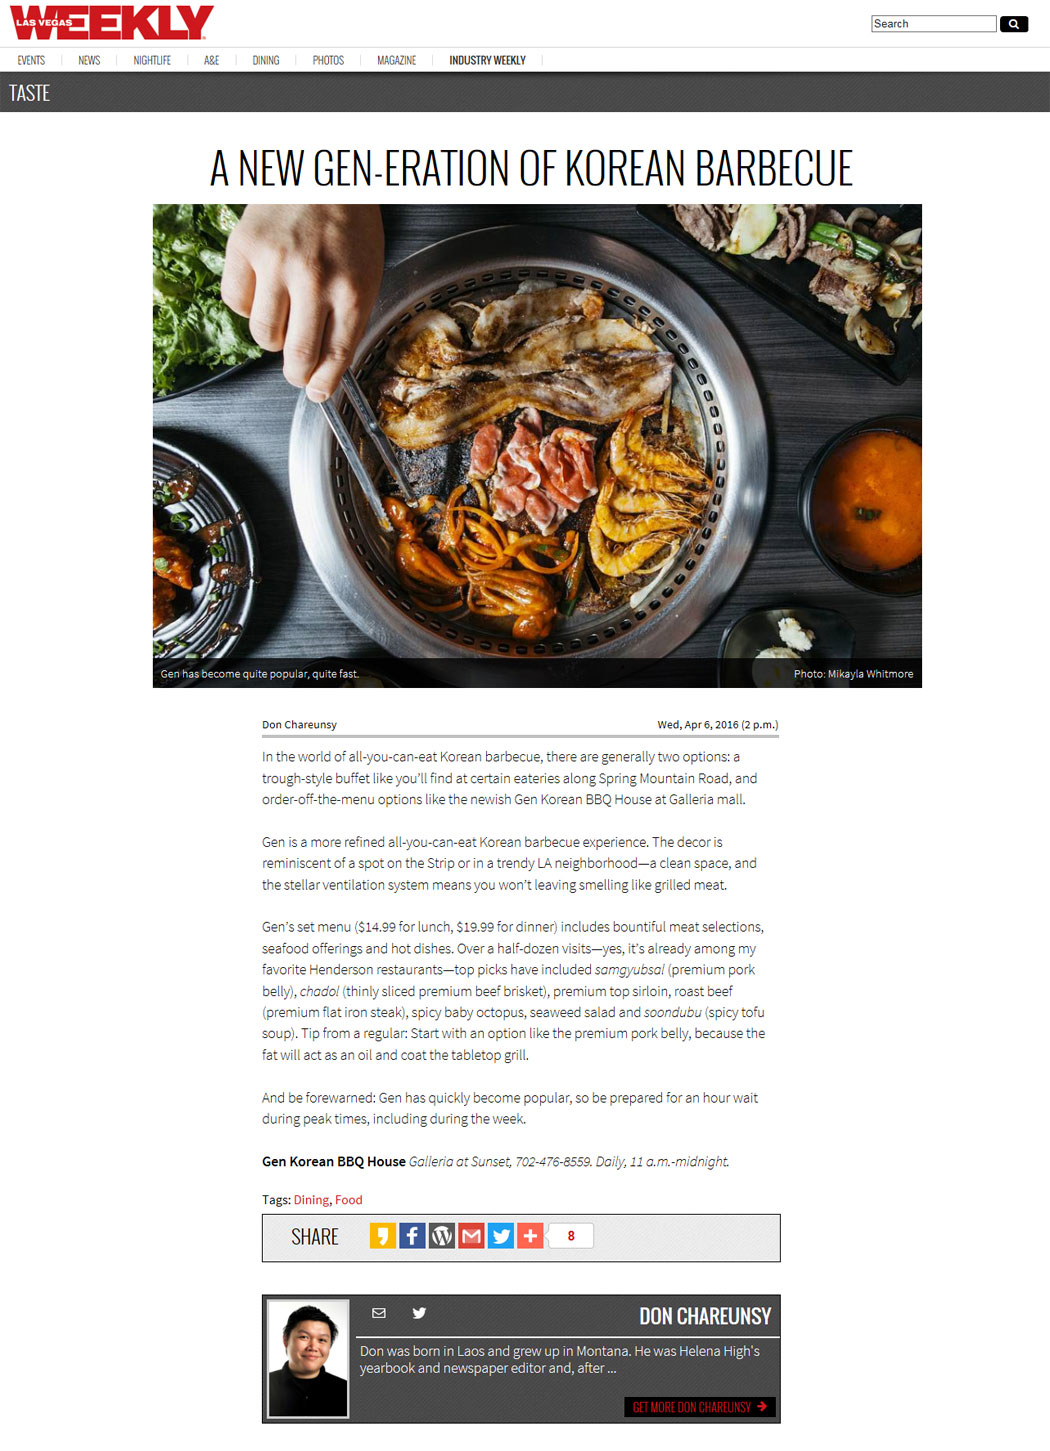 M-A-new-Gen-eration-of-Korean-barbecue.jpg